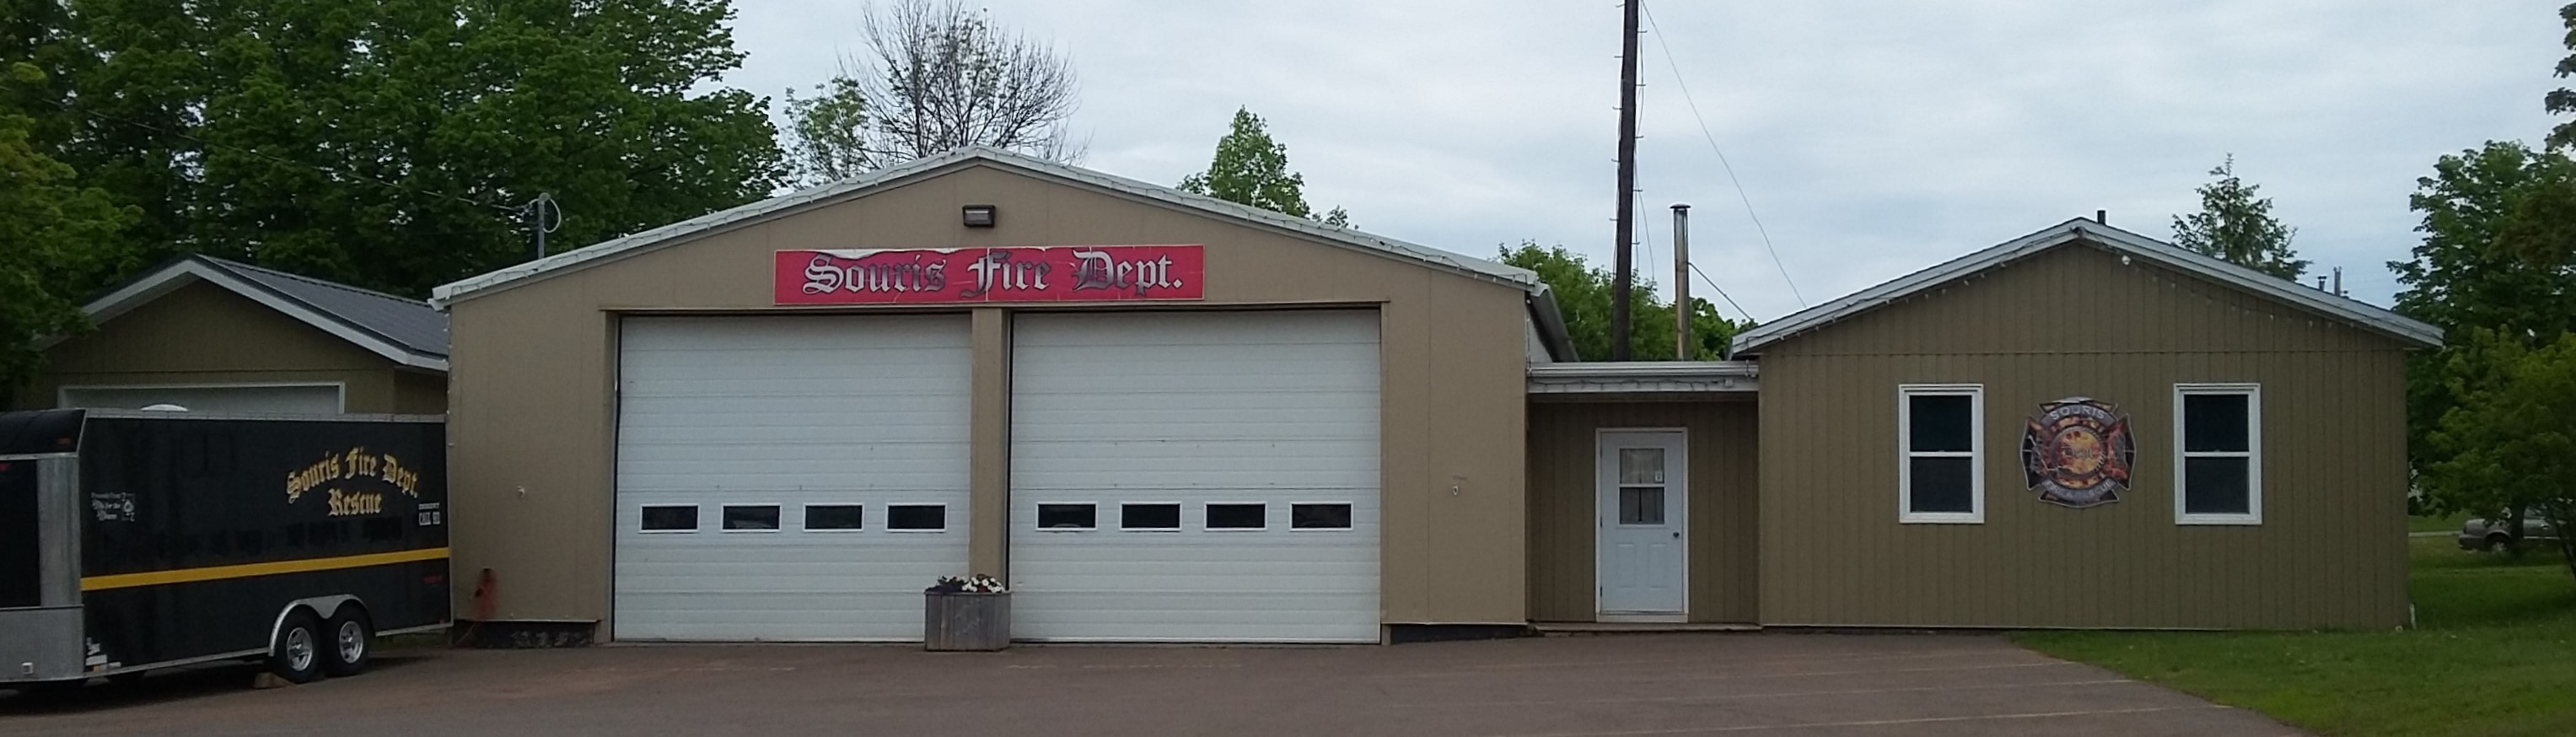 Souris Fire Department